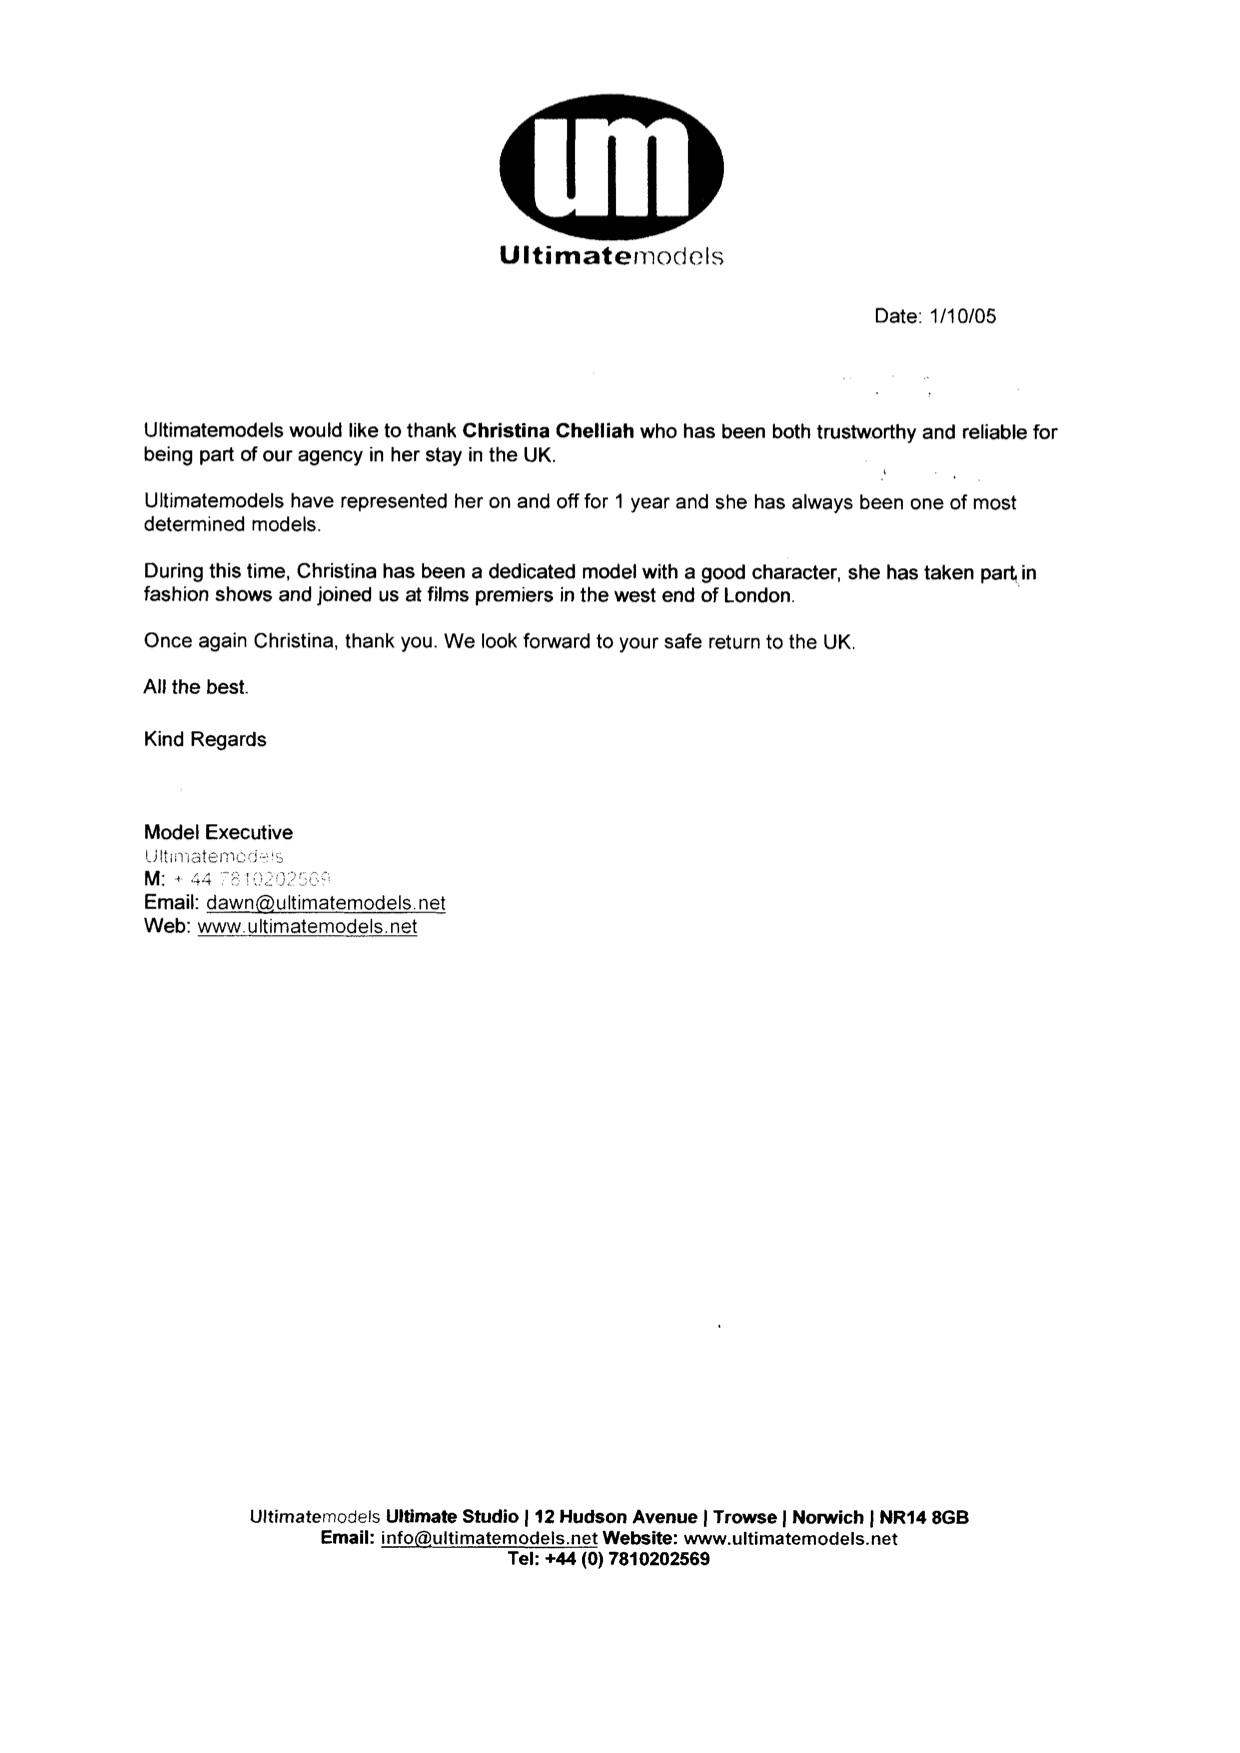 2005 - Modeling - Ultimate Models - Reference Letter.jpg